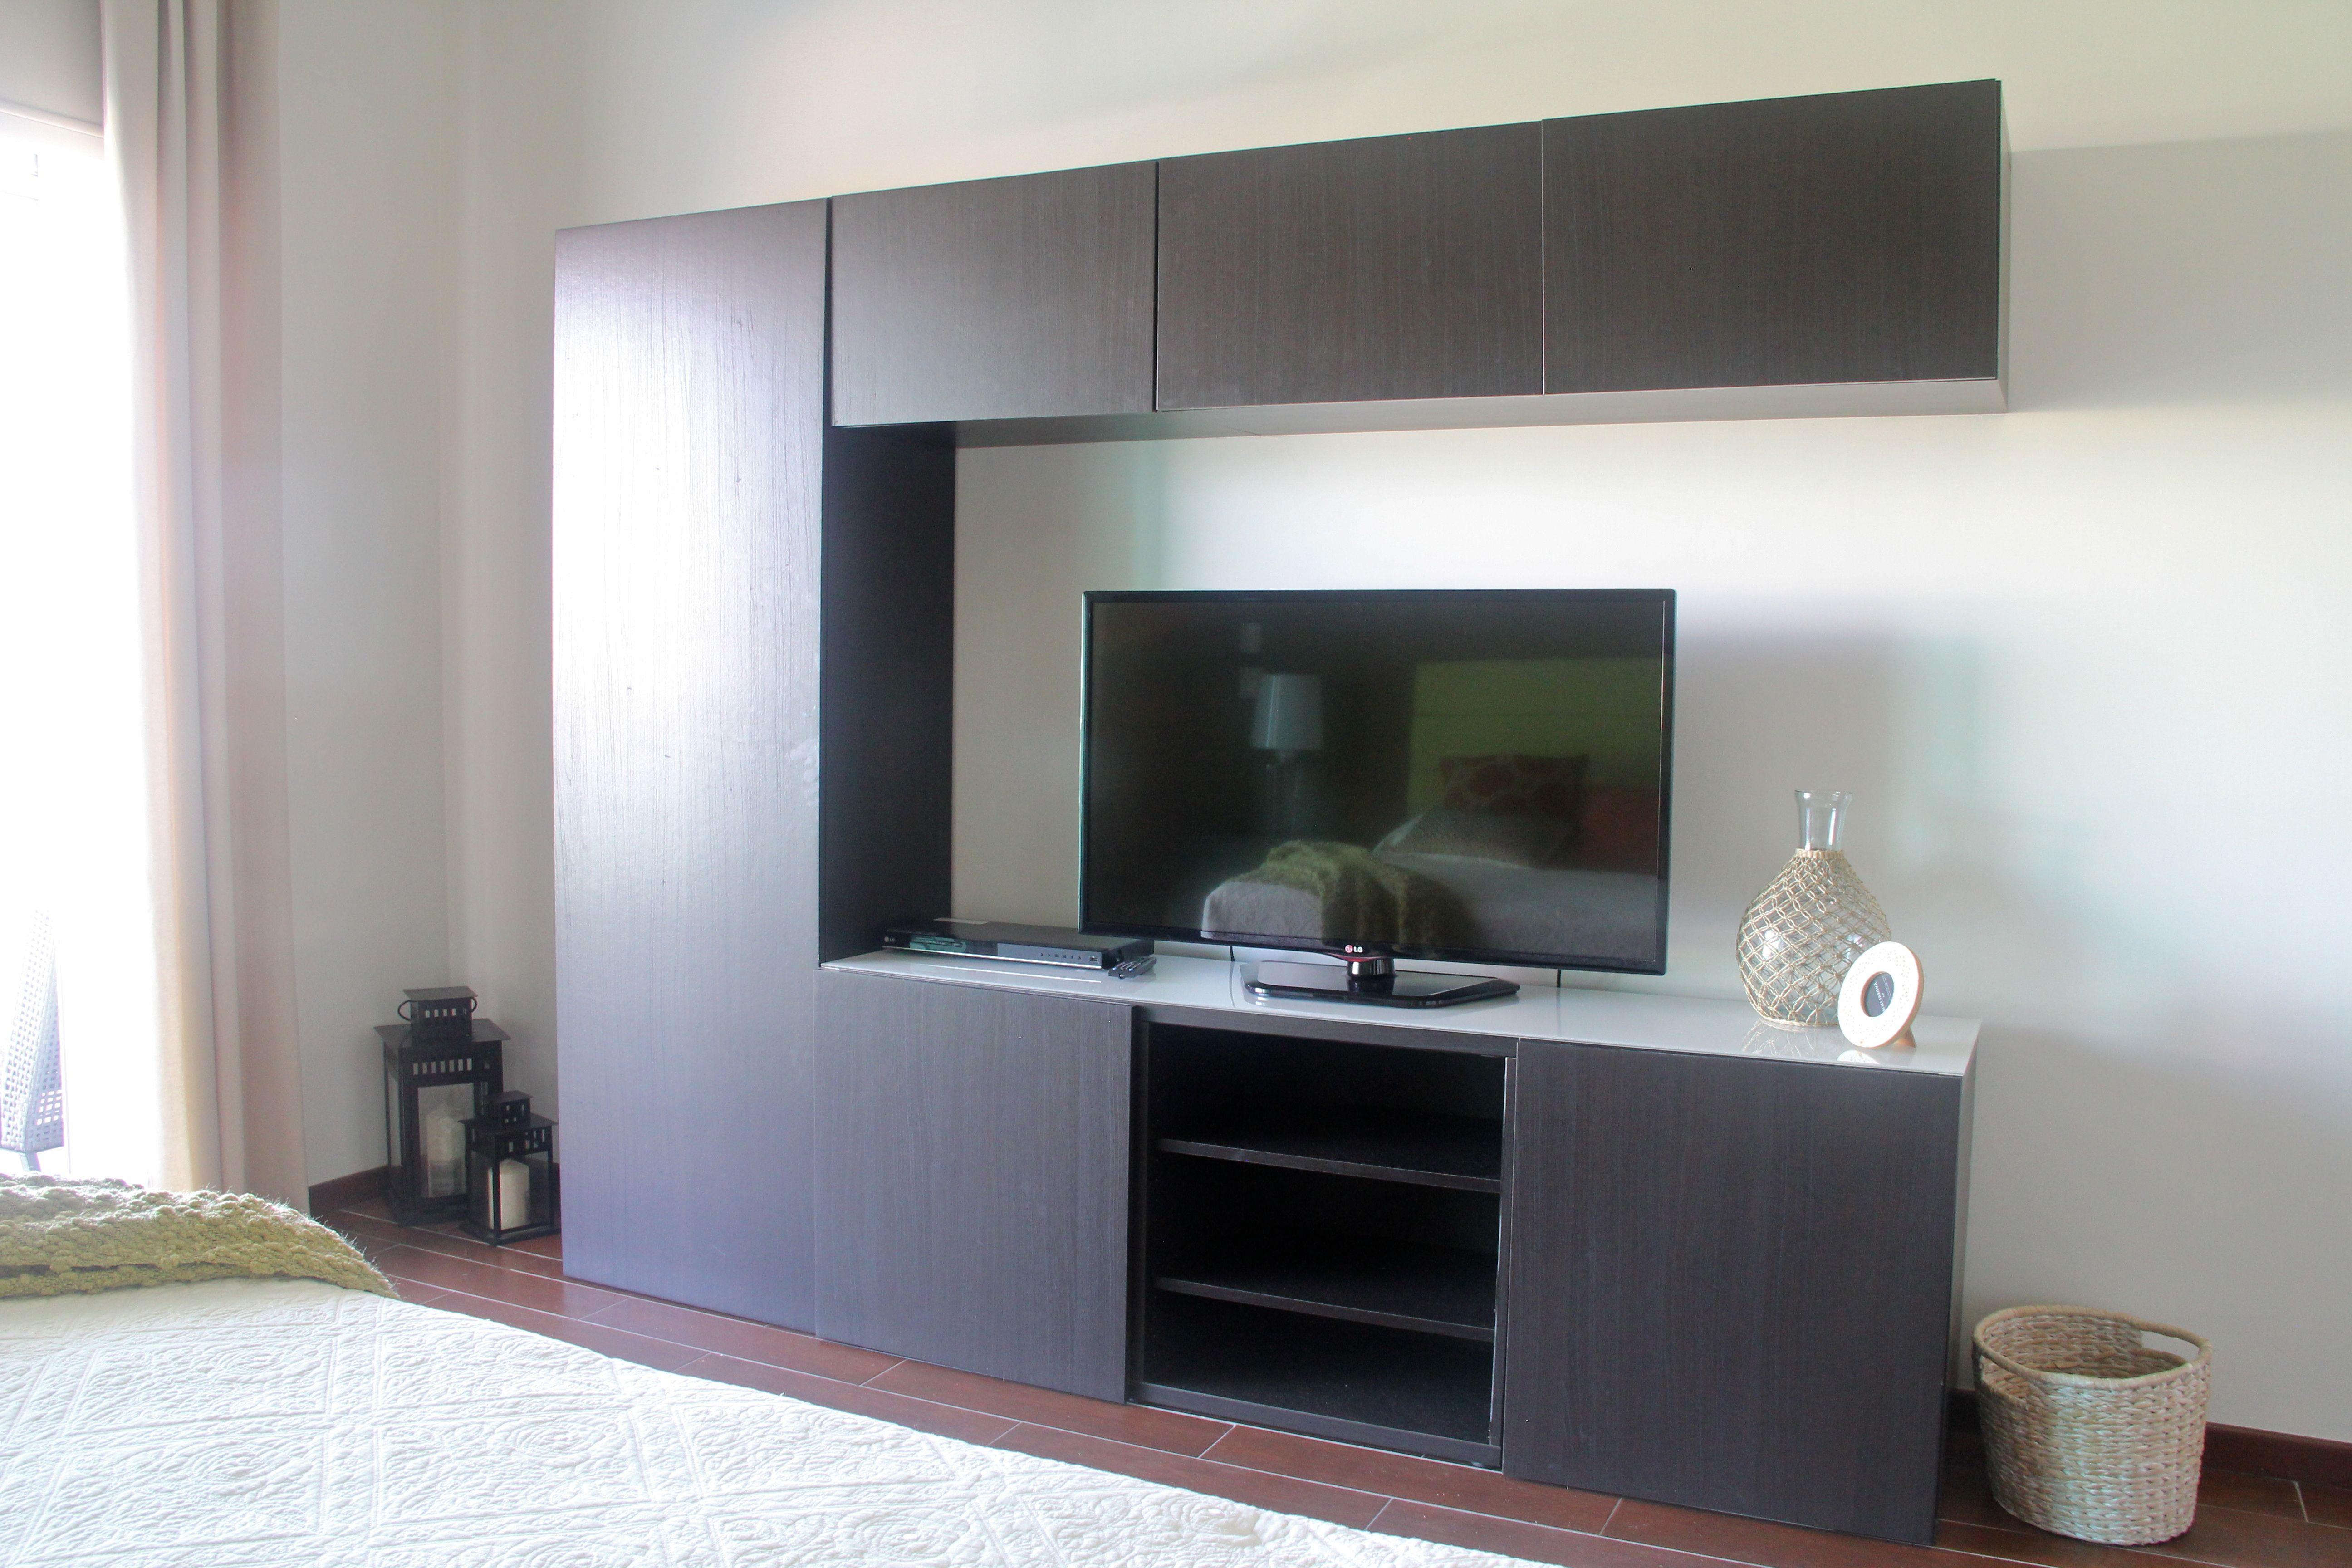 TV centre in master bedroom.